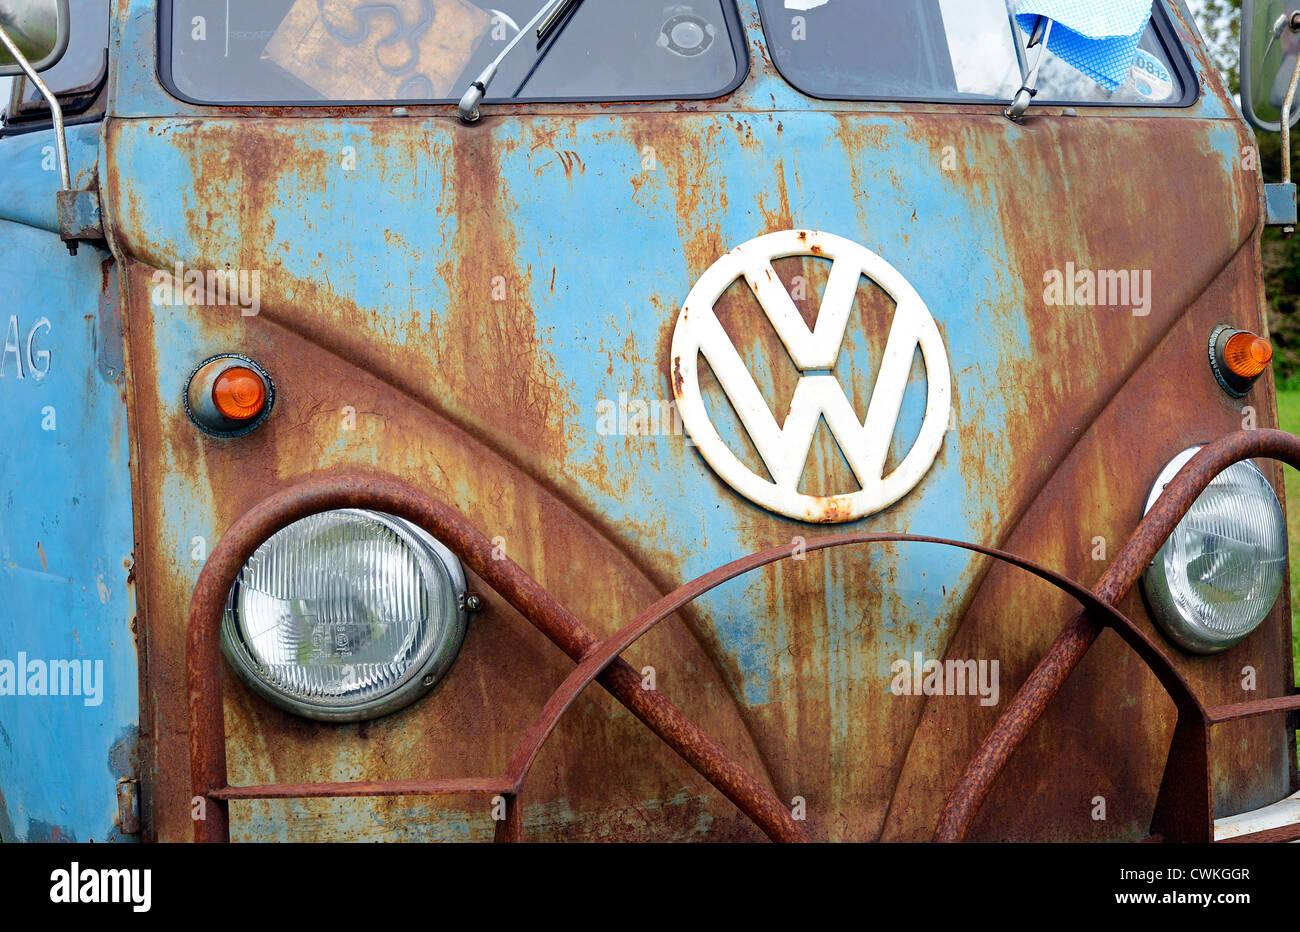 A rusty VW camper van - Stock Image